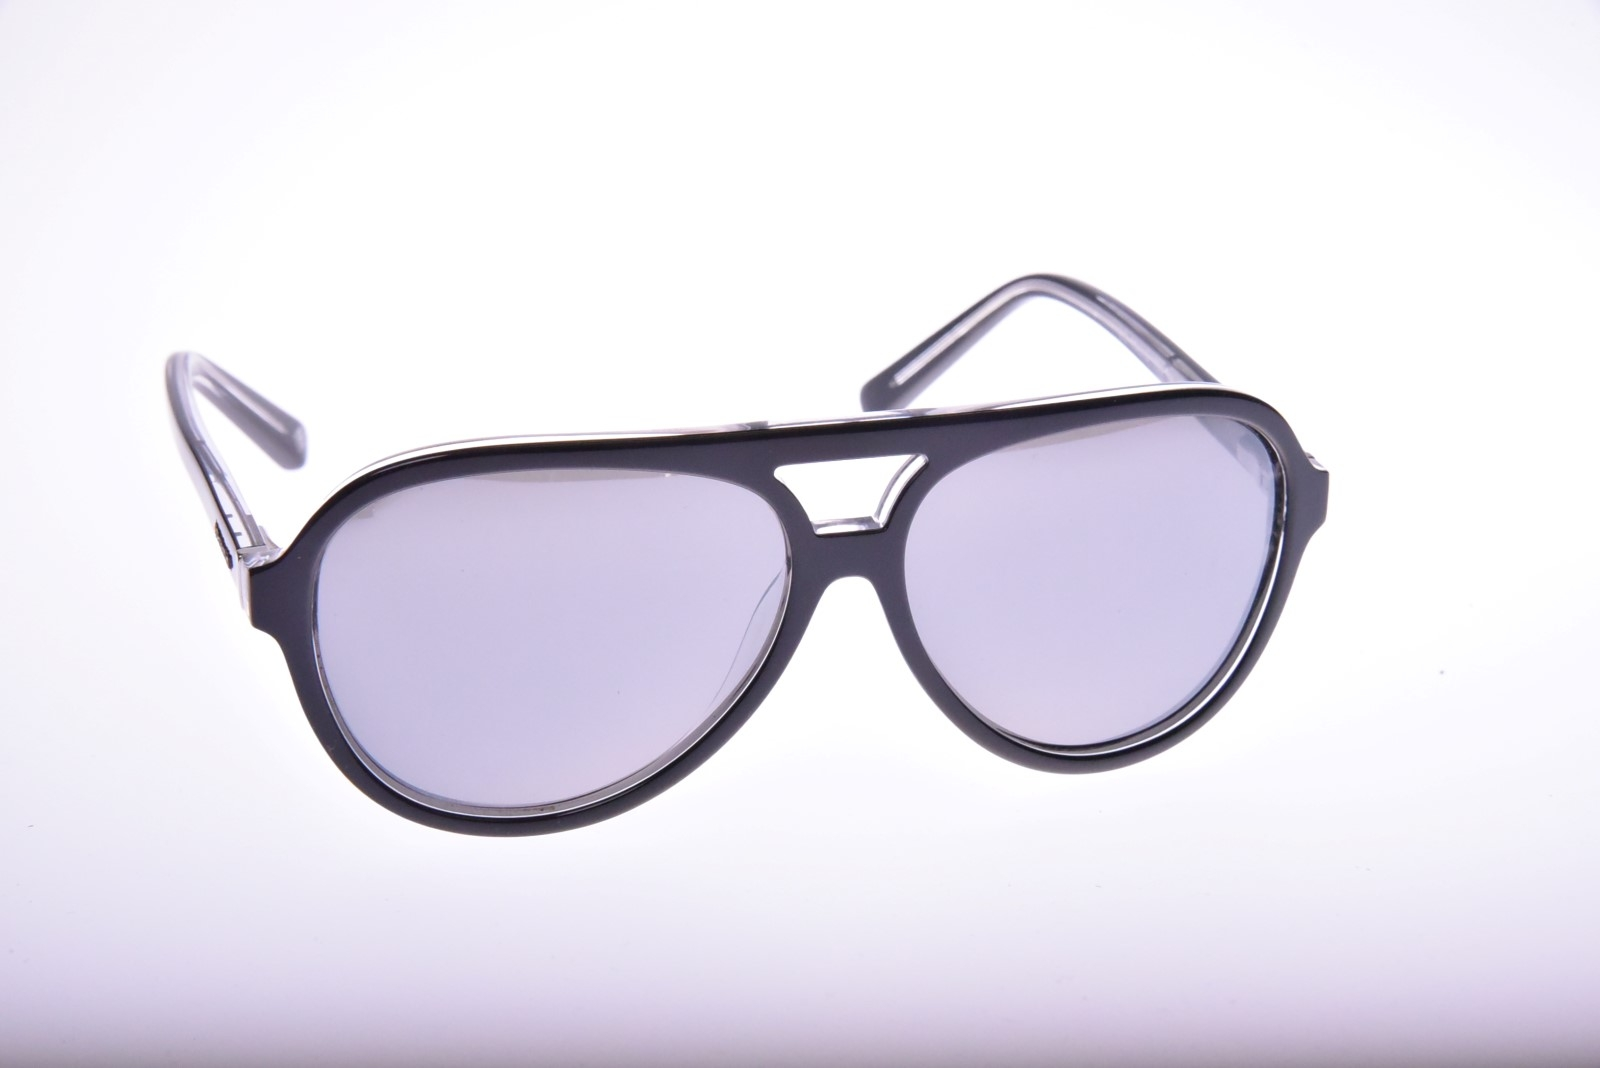 Polaroid Premium X8401B - Dámske slnečné okuliare